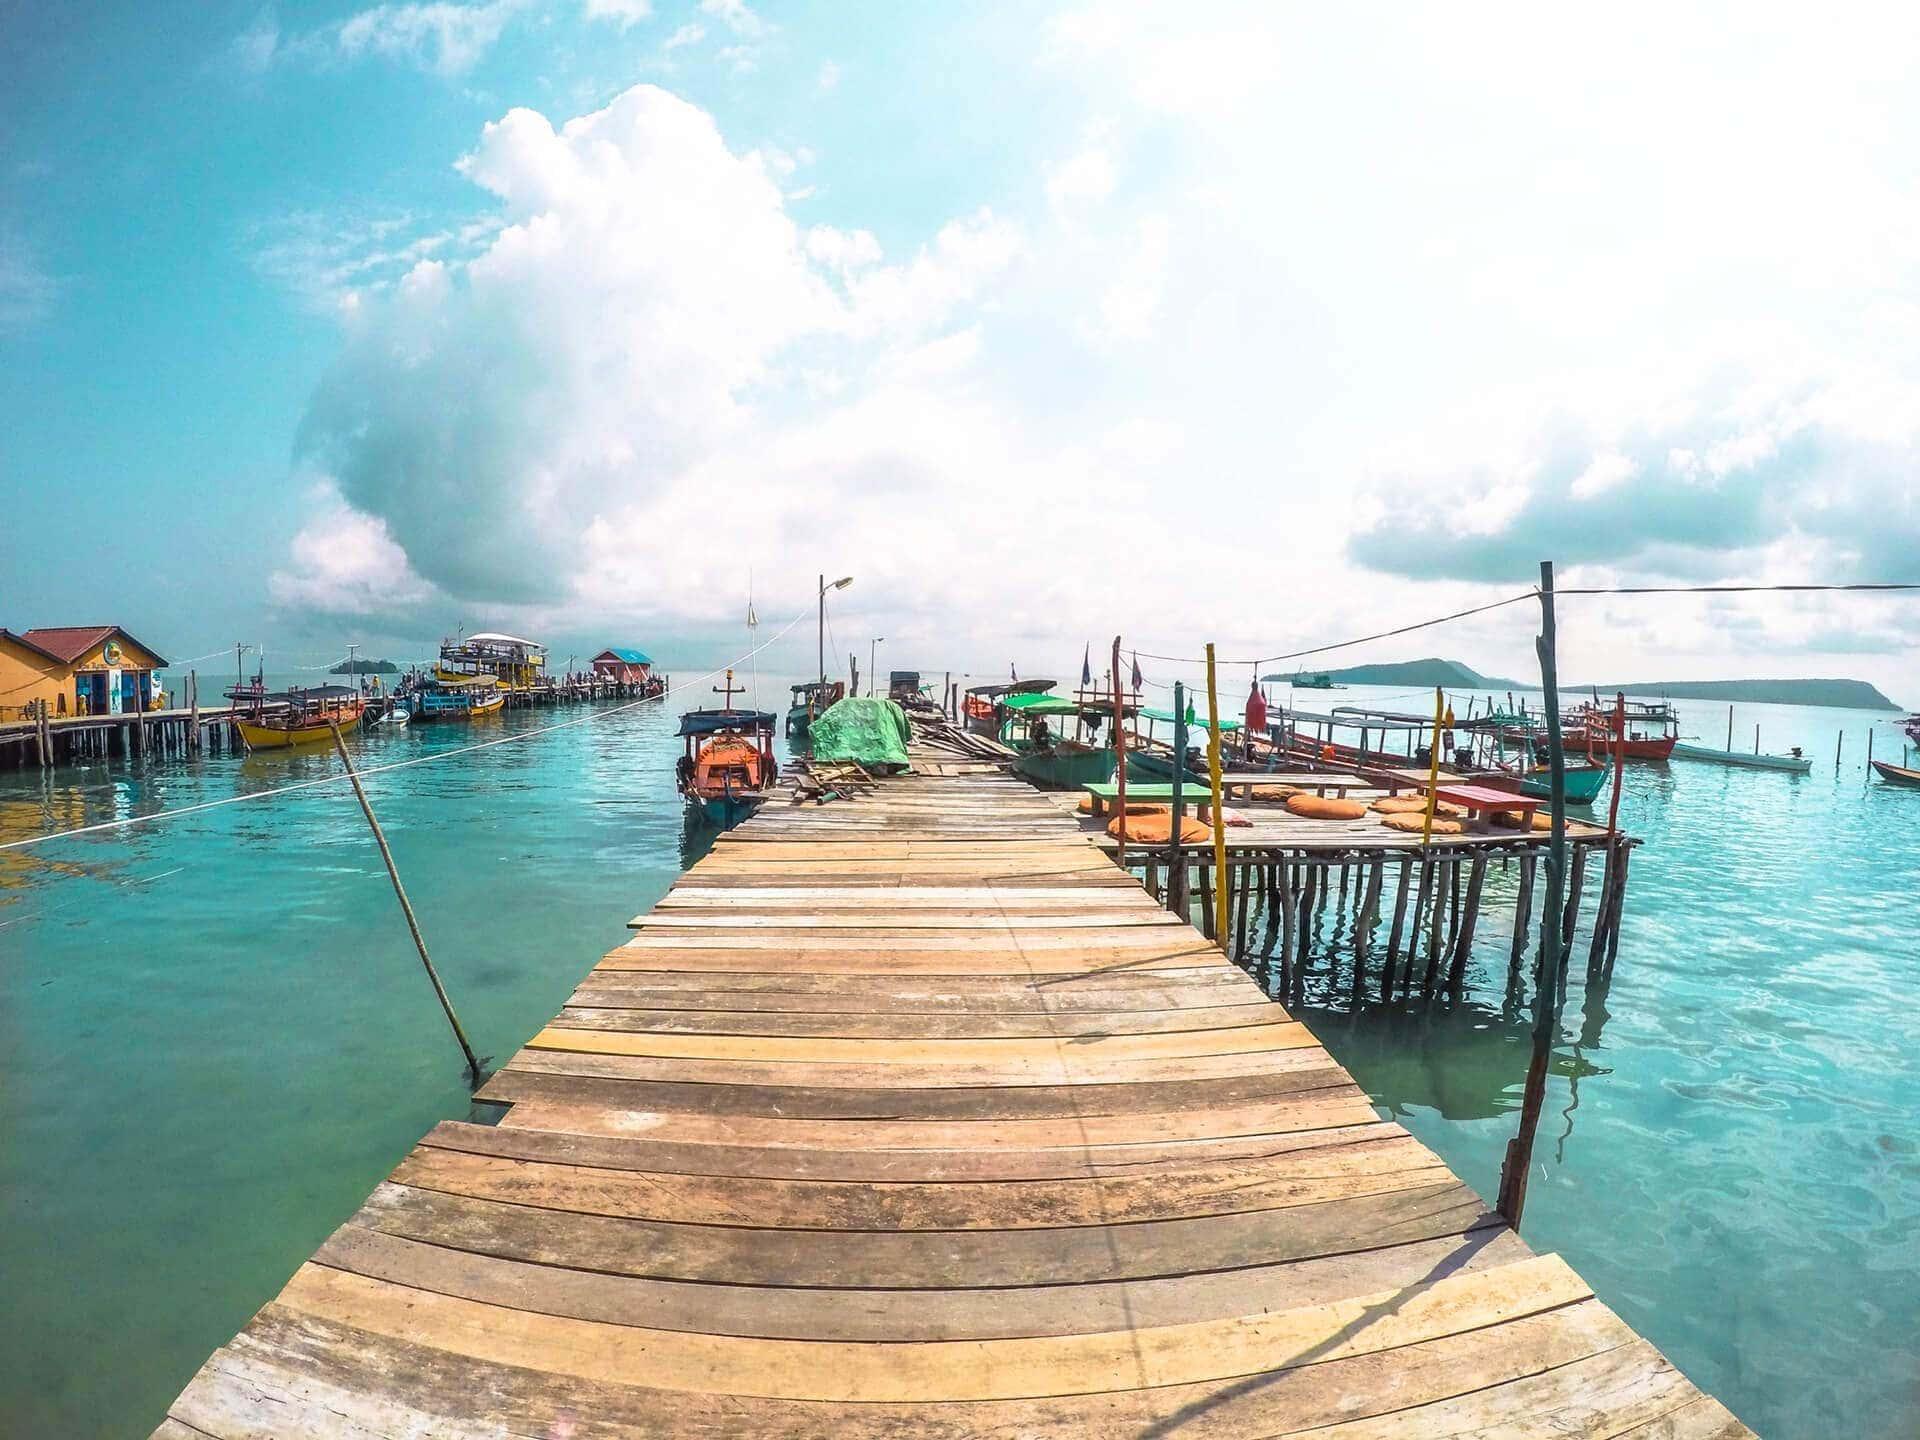 cambodia koh rong island pier